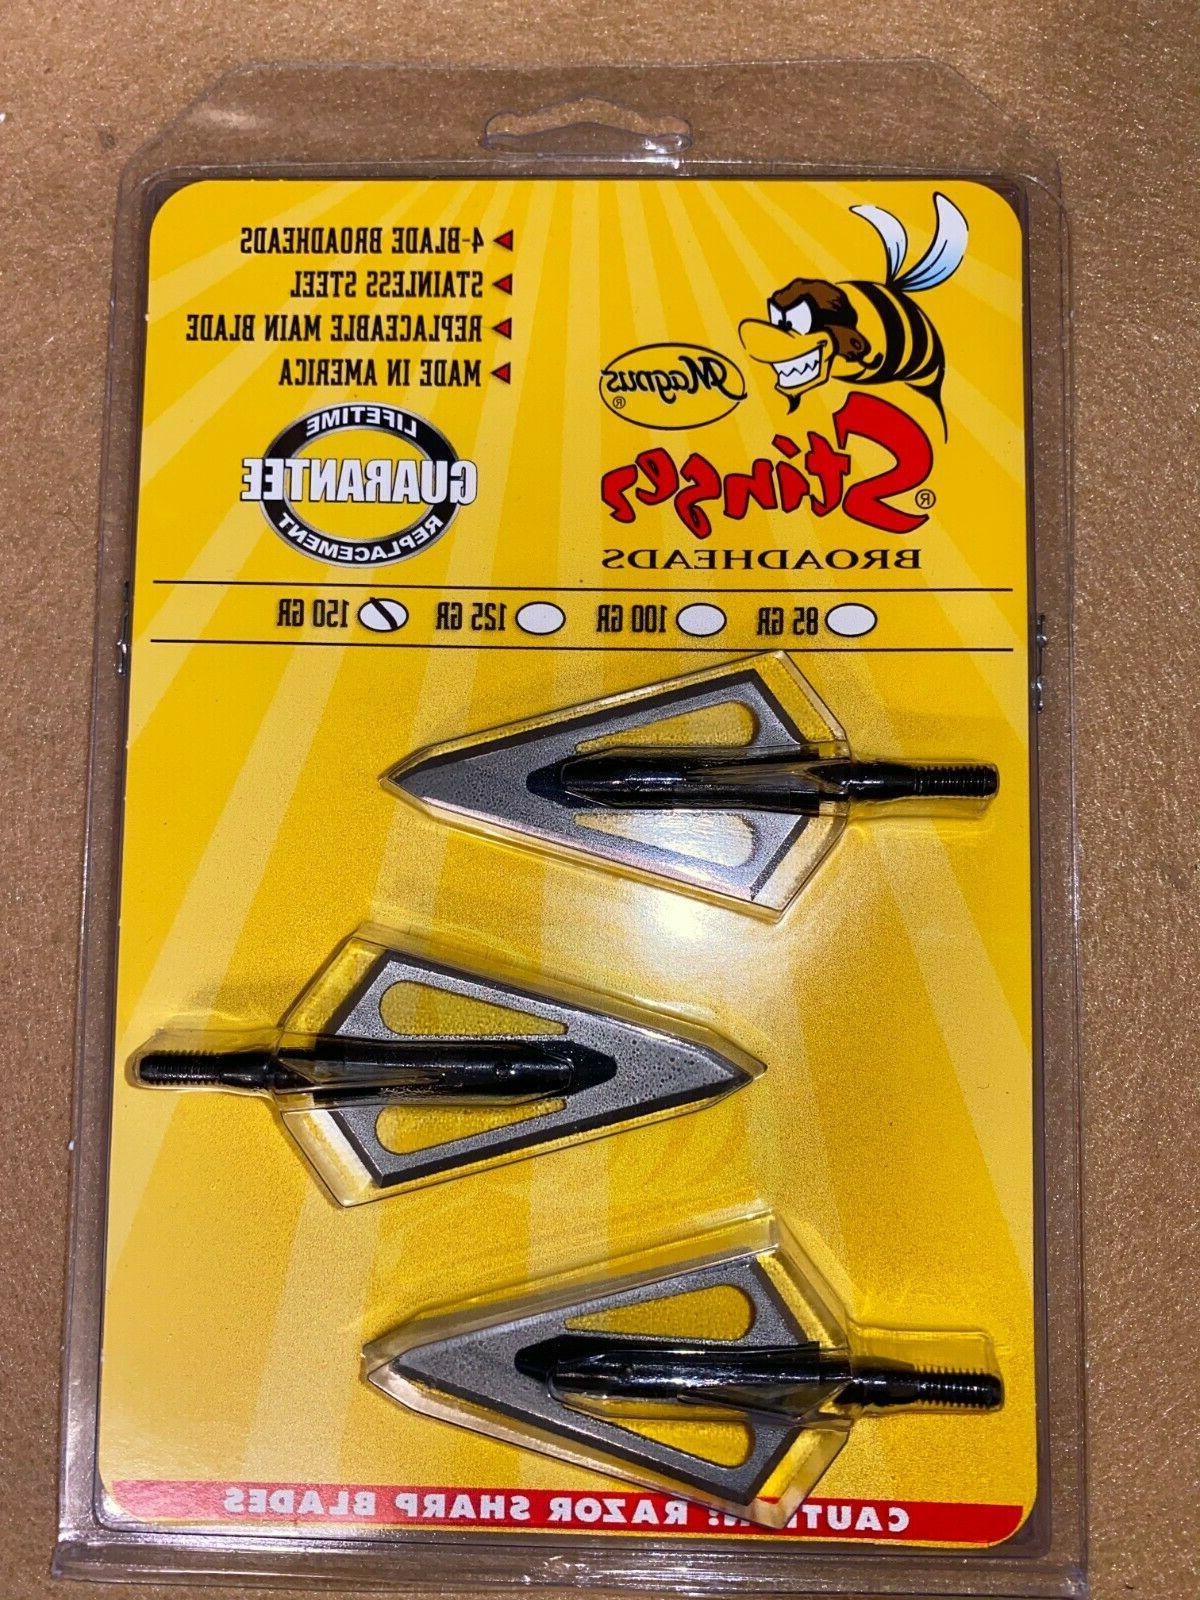 stringer4 blade broadhead 150 grs